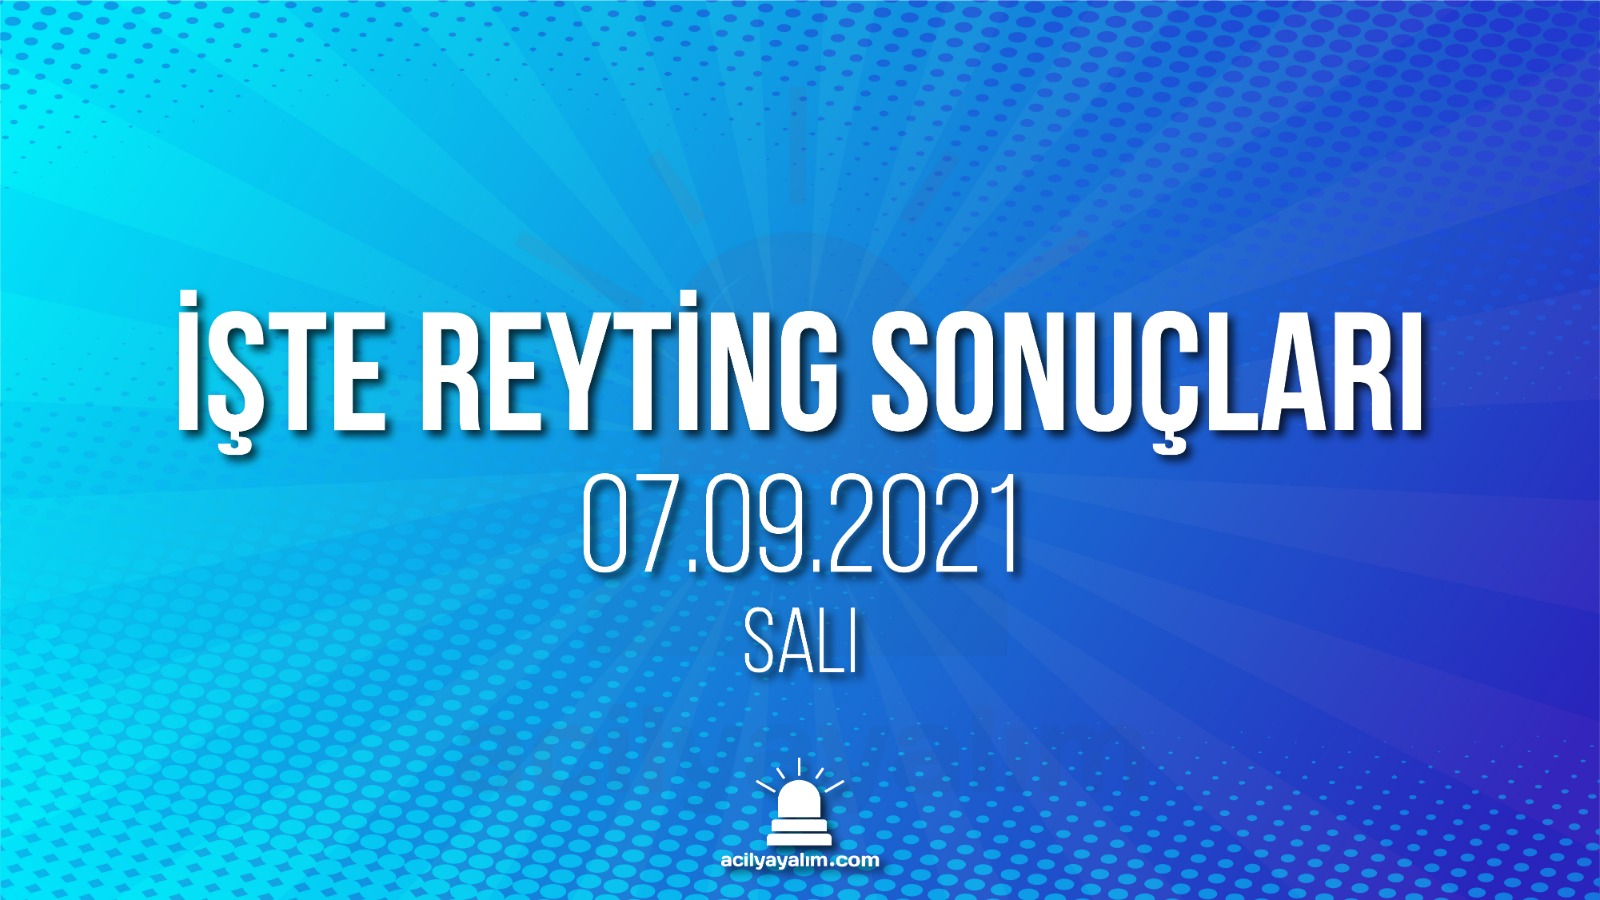 7 Eylül 2021 Salı reyting sonuçları